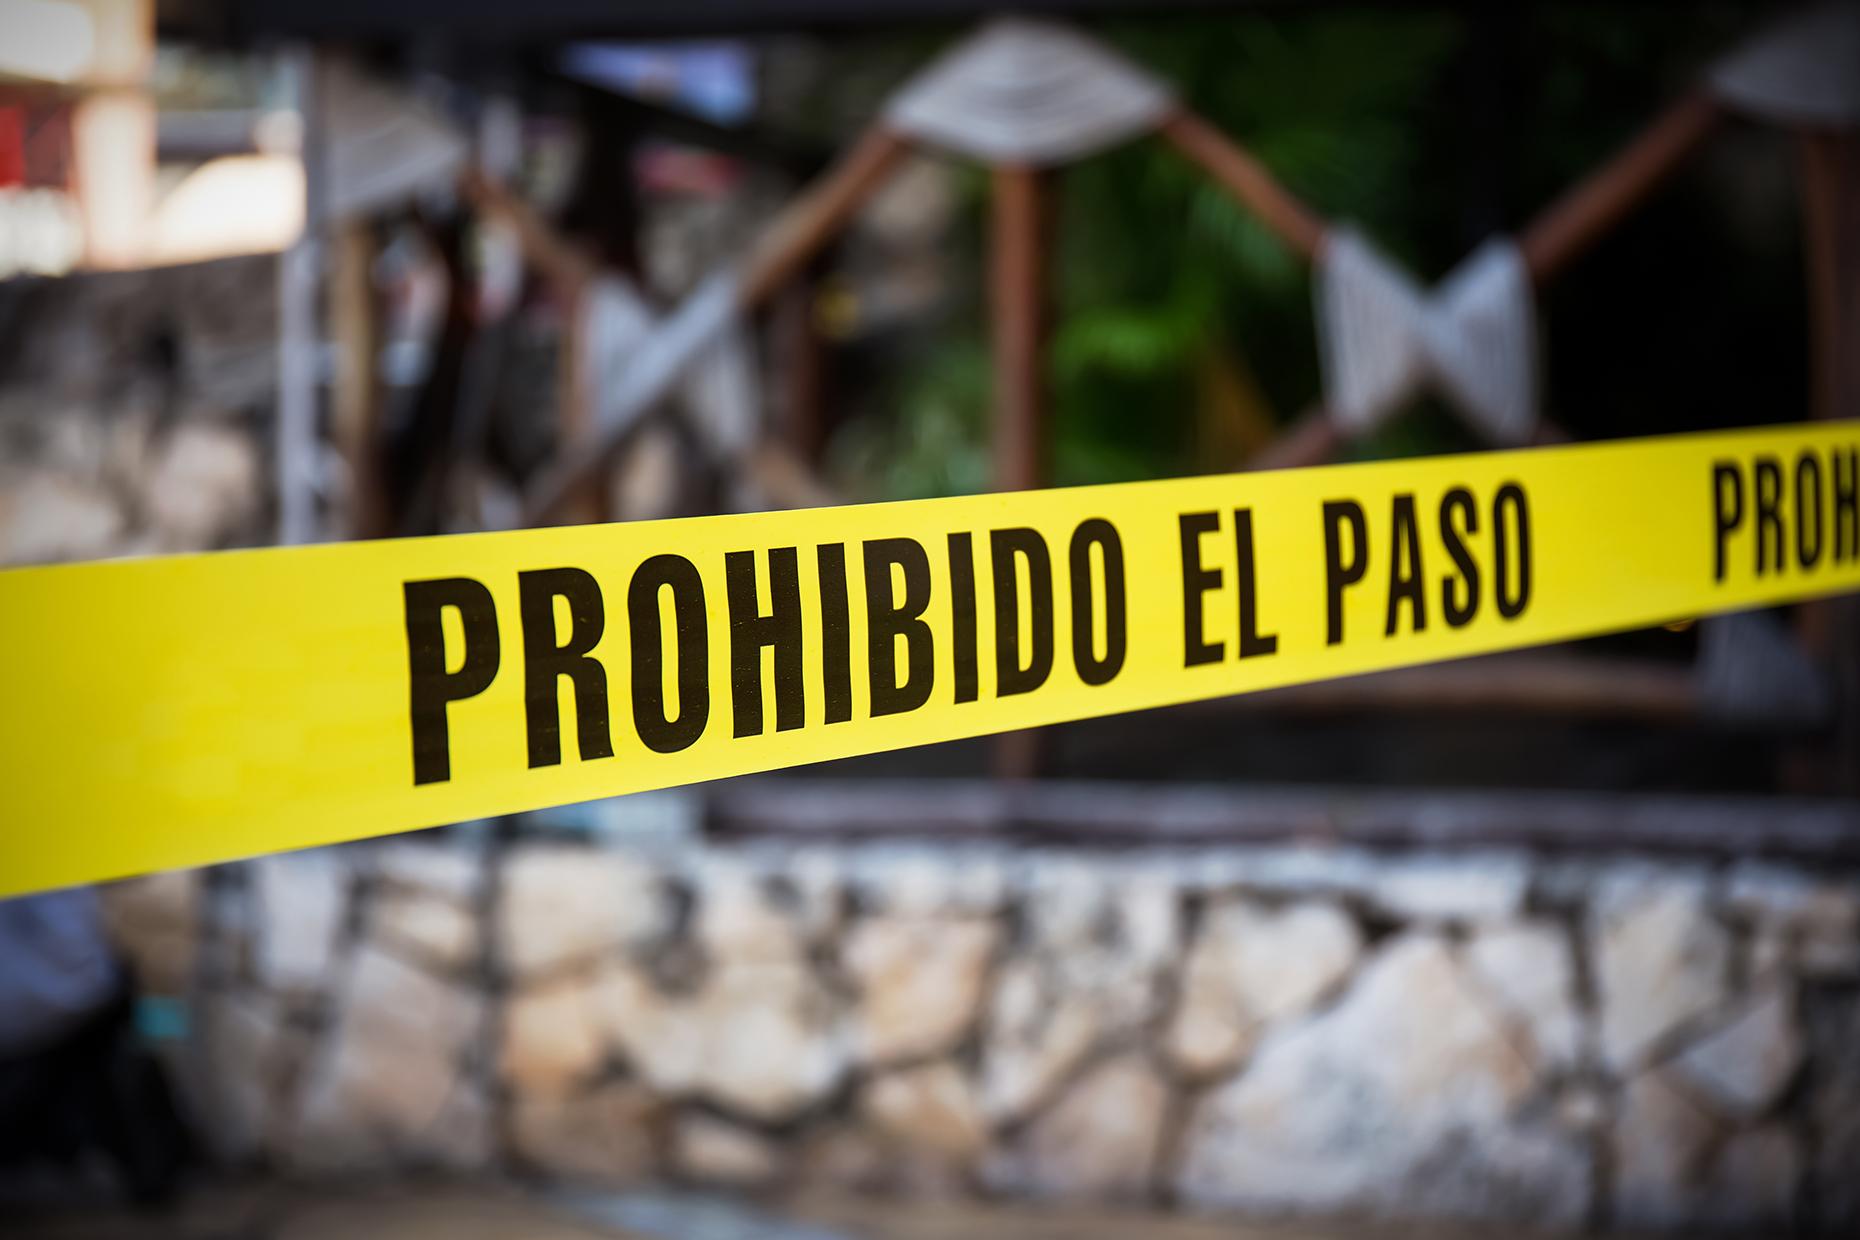 Brasil: trece personas murieron en intentos de asalto a bancos